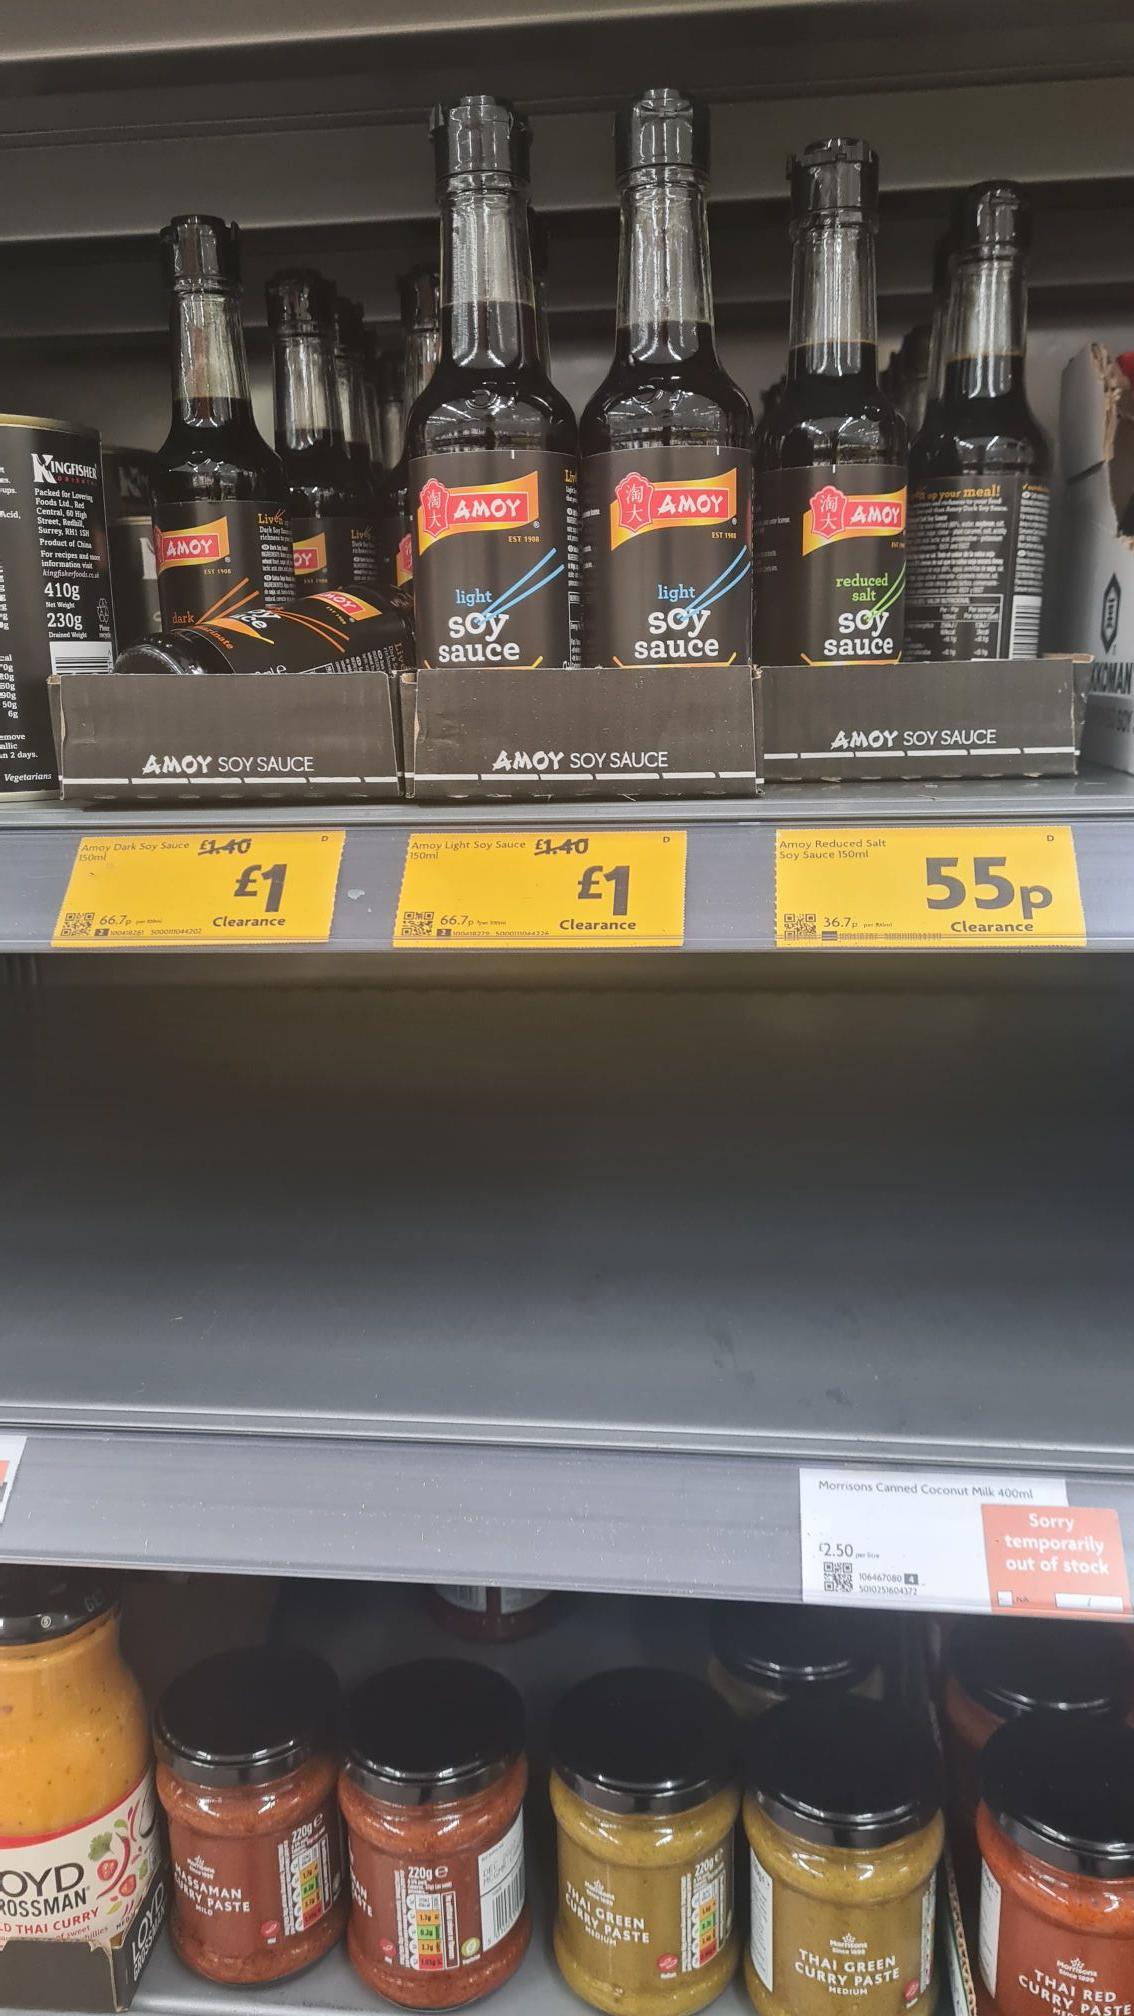 Amoy soy sauce 55p instore @ Morrisons (Berwick-upon-Tweed)